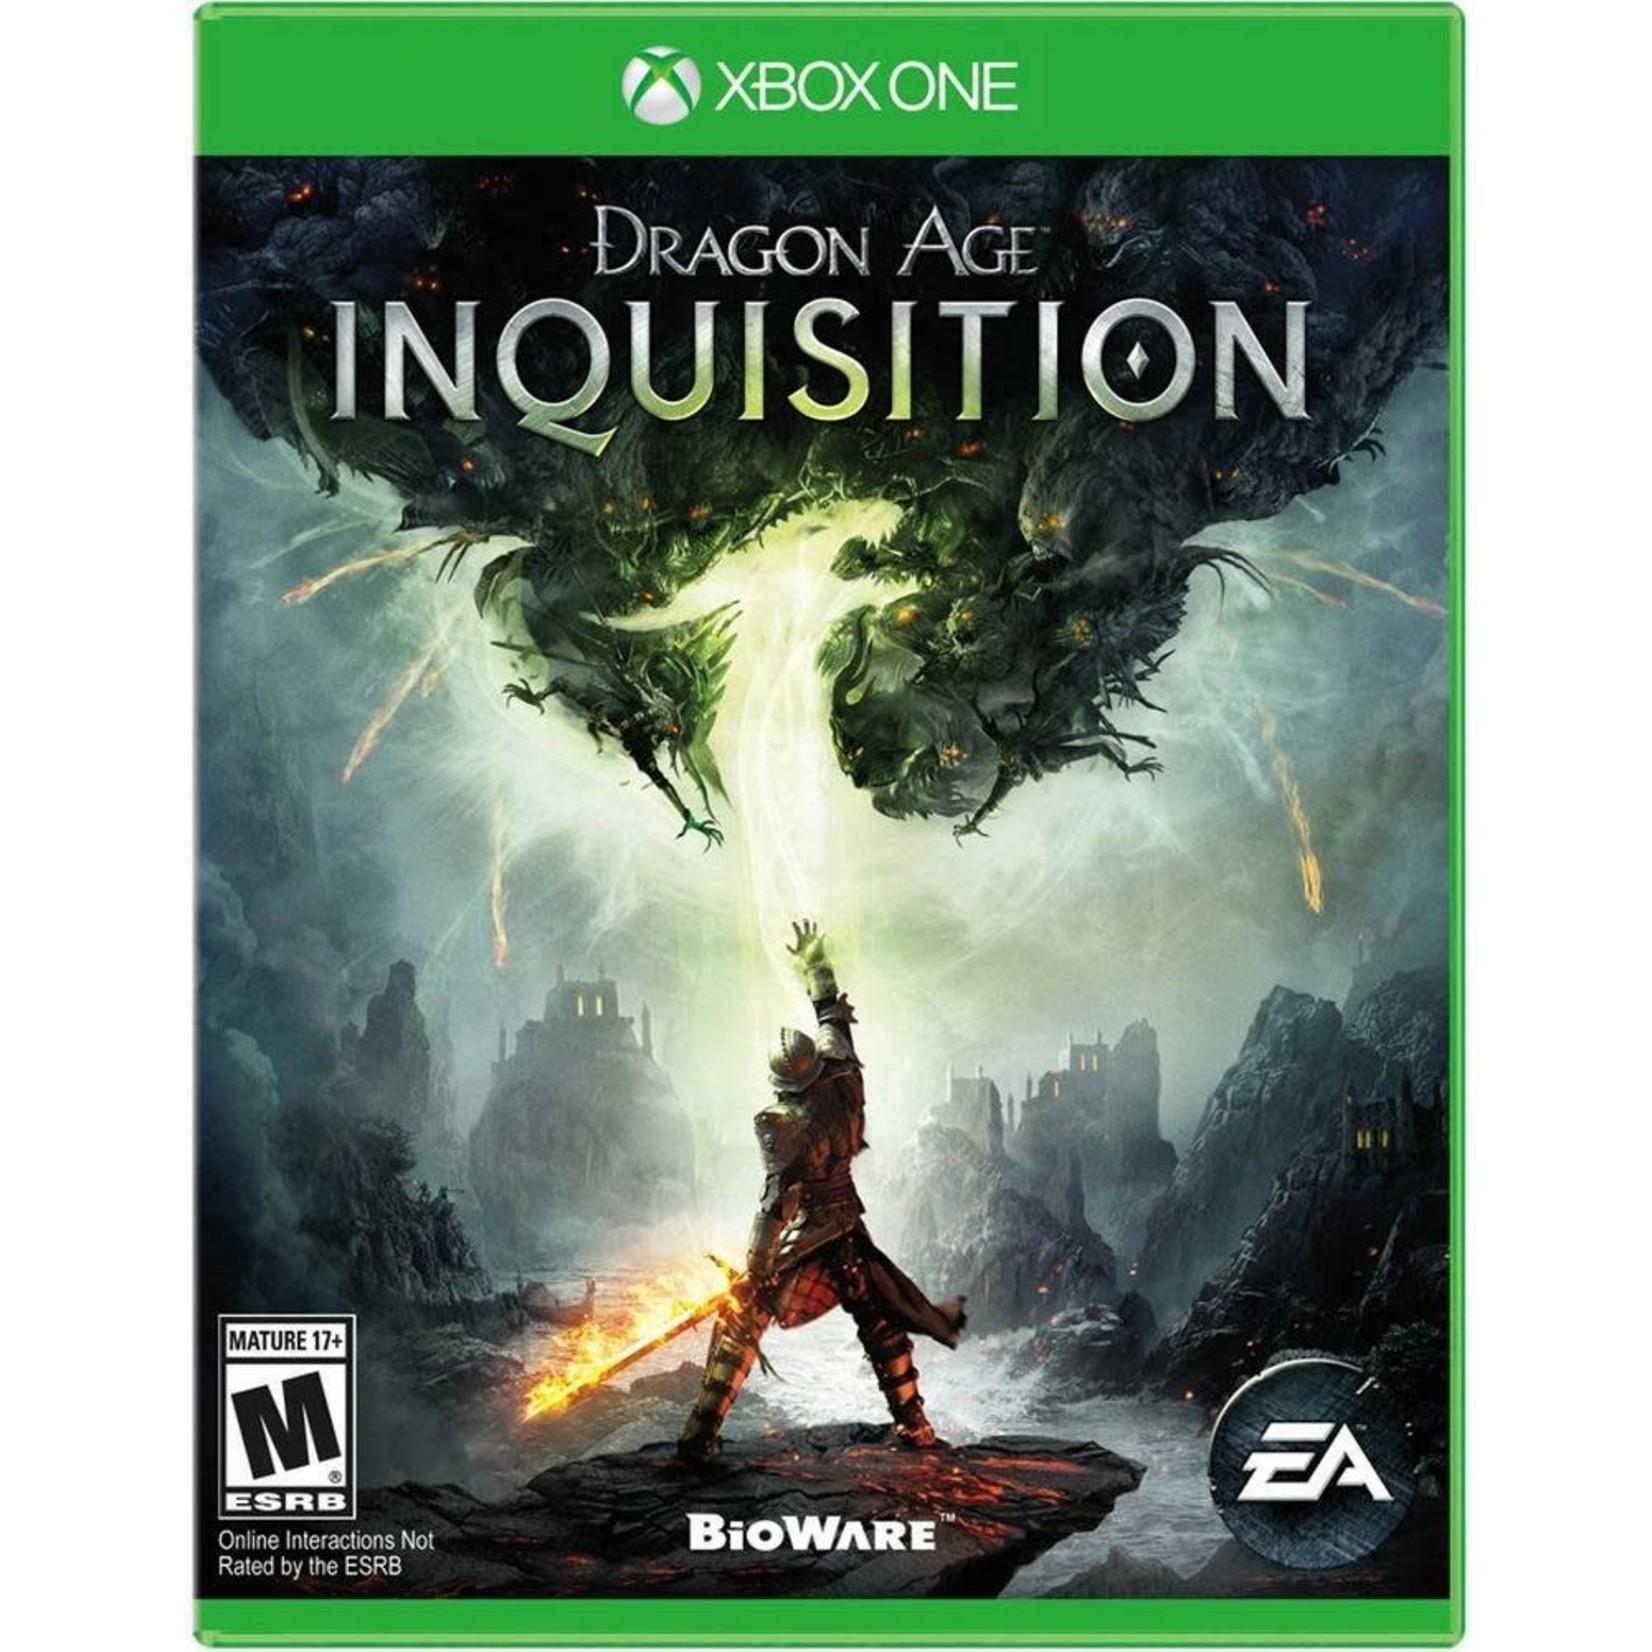 XB1-Dragon Age: Inquisition